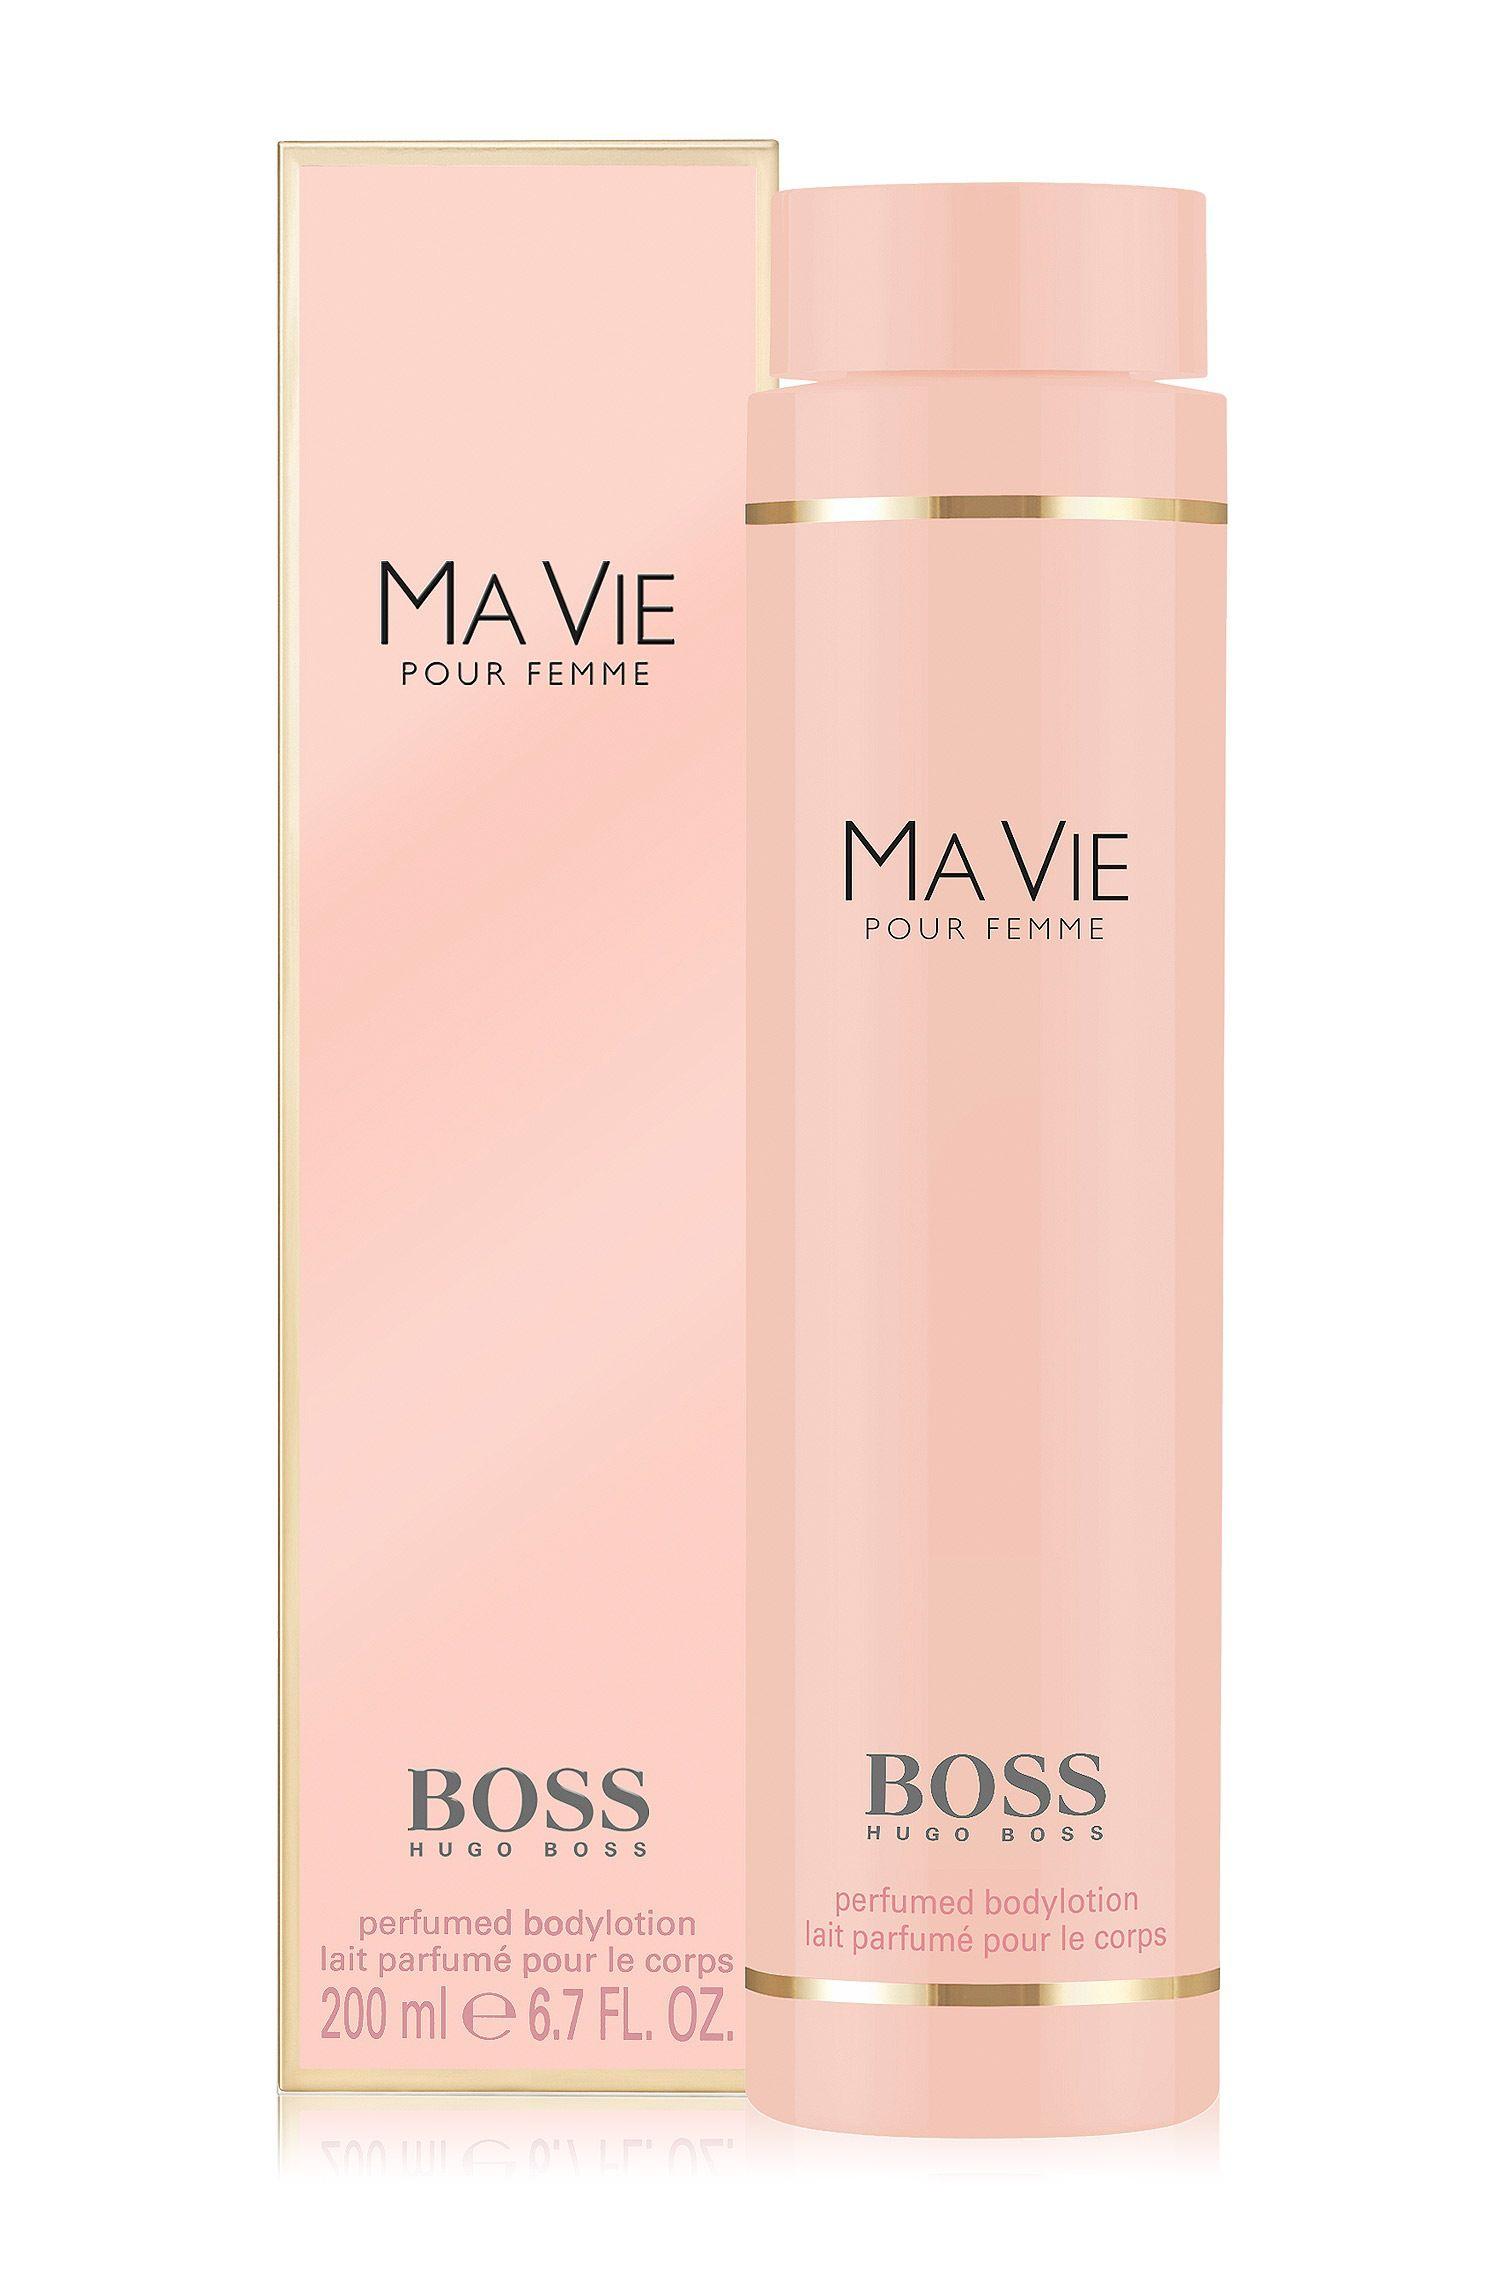 BOSS Ma Vie pour femme body lotion 200ml